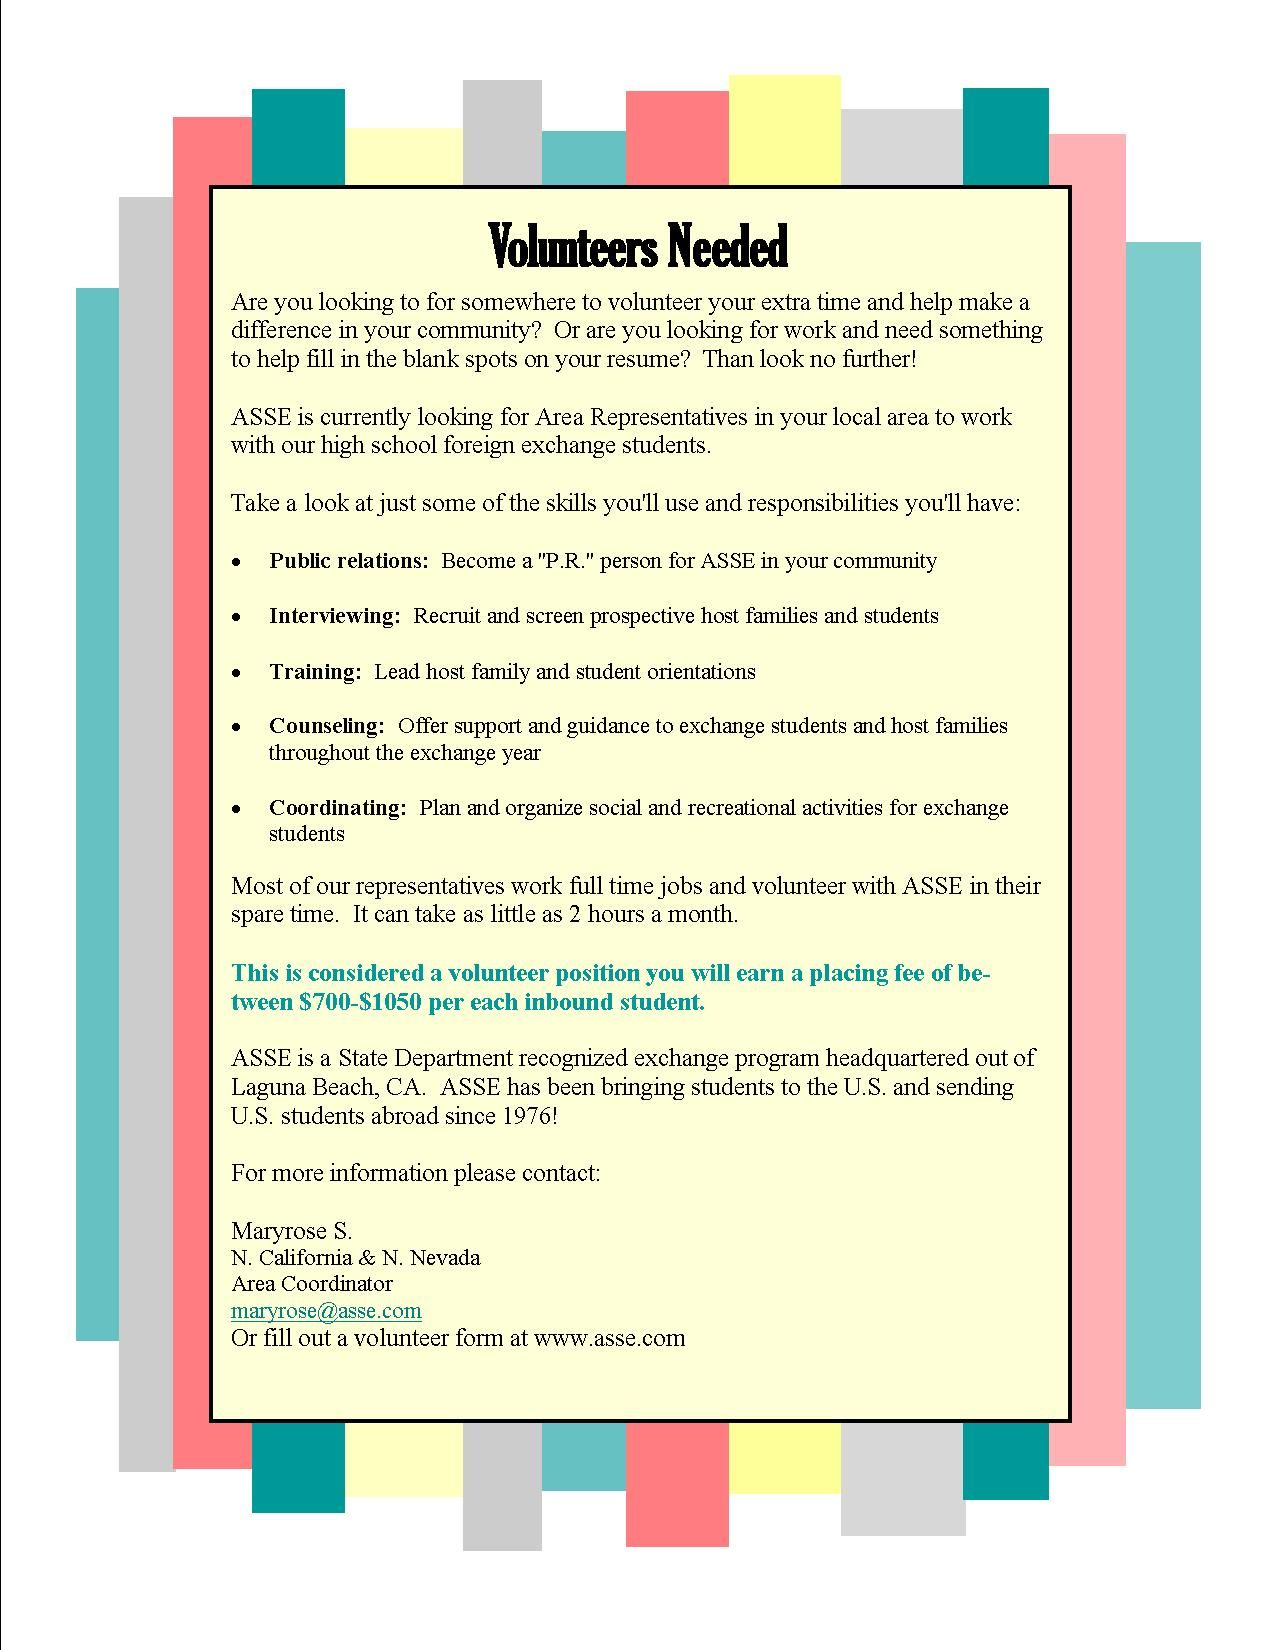 volunteer, study abroad, exchange students, ASSE